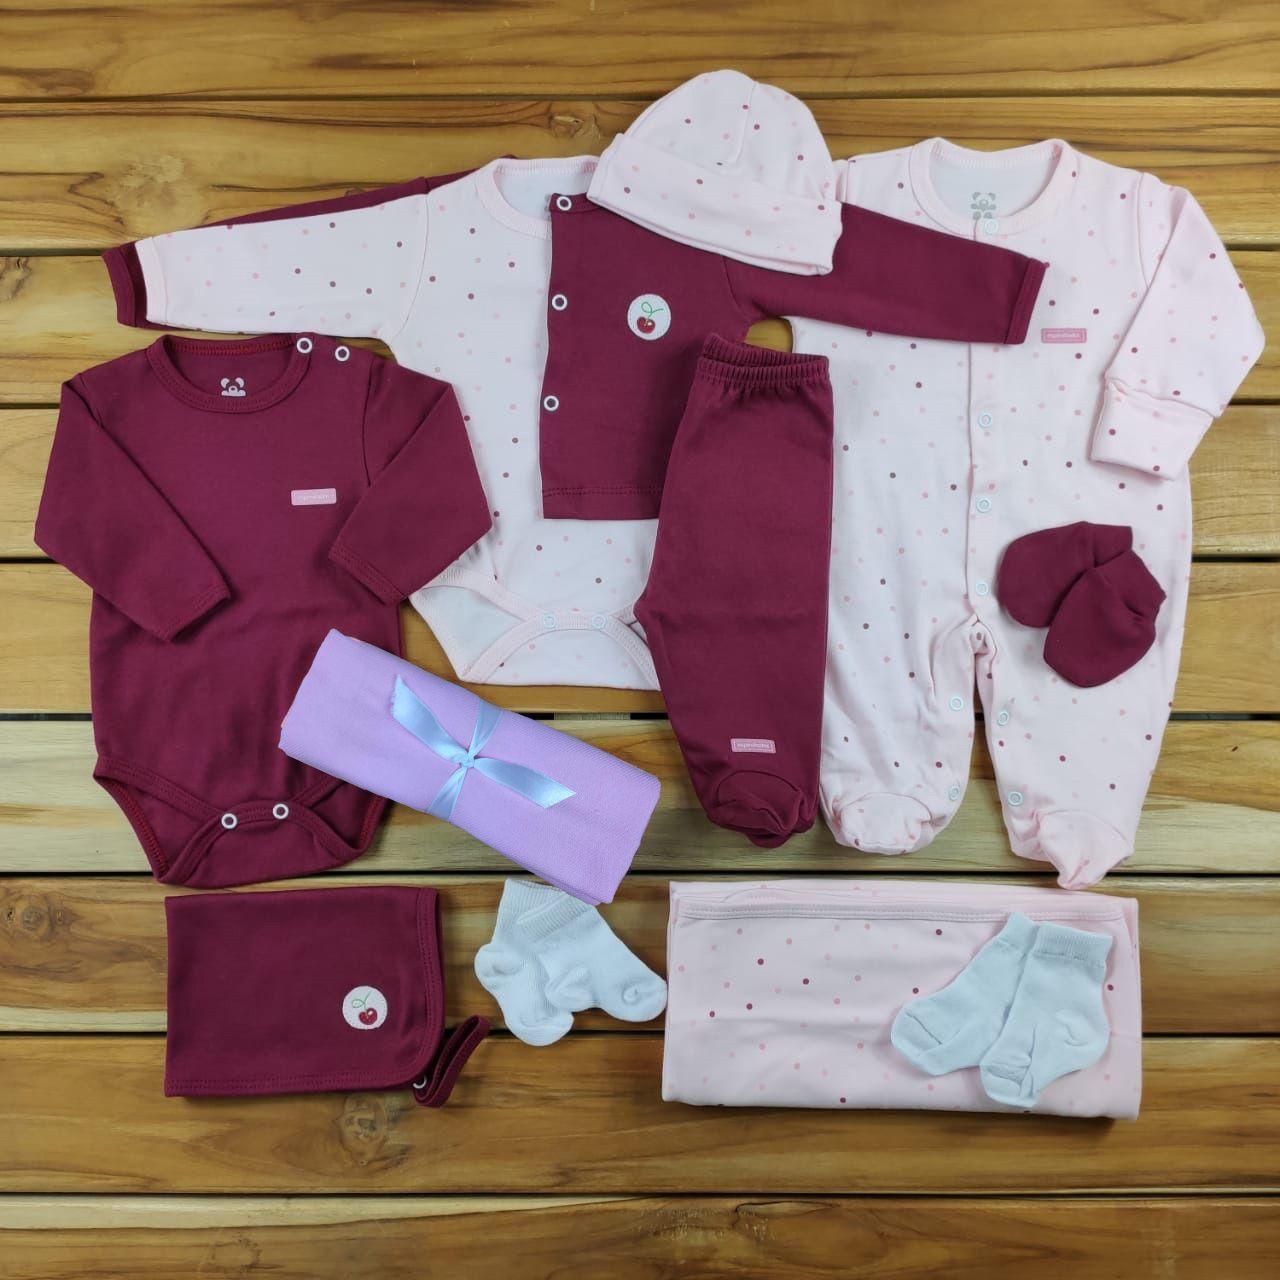 Kit Maternidade Rosa e Marsala - 12 Peças